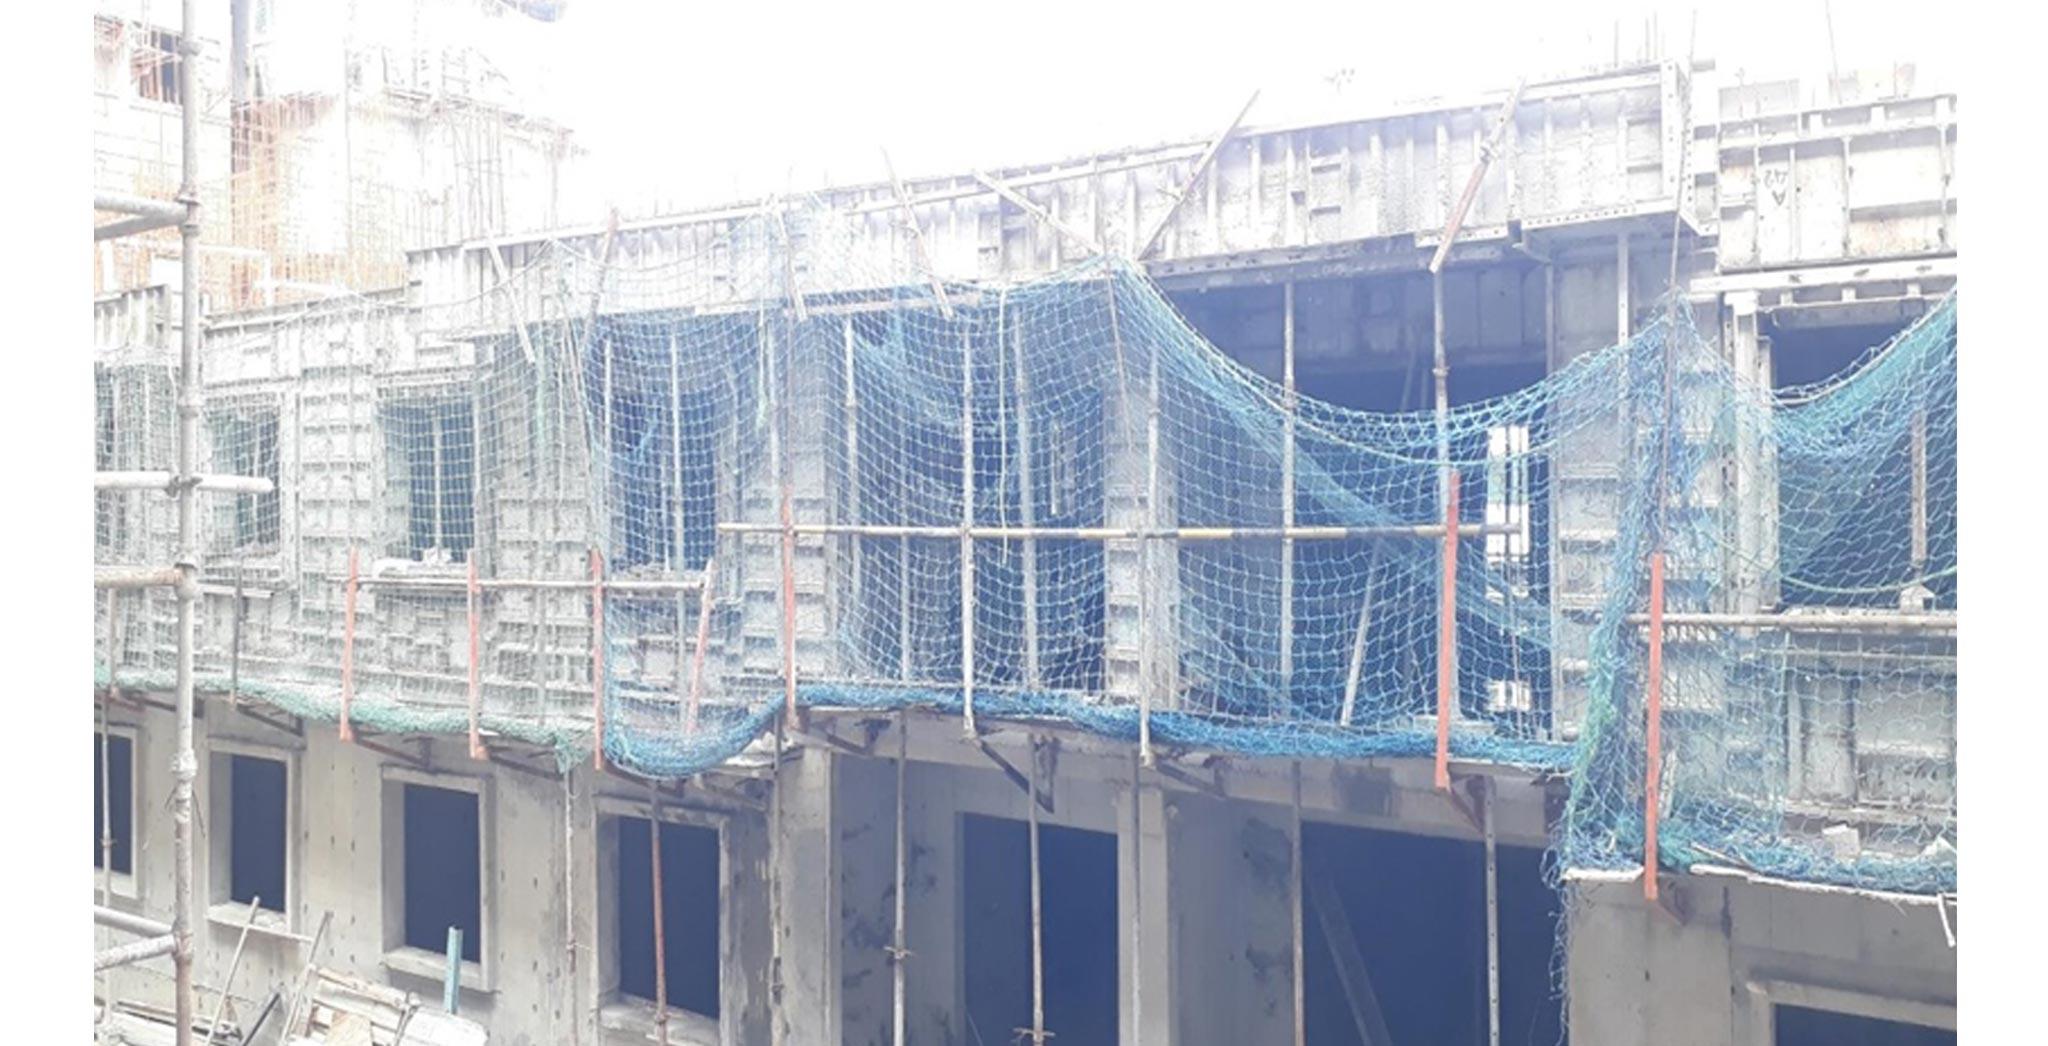 Jul 2021 - J block - Second floor slab completed